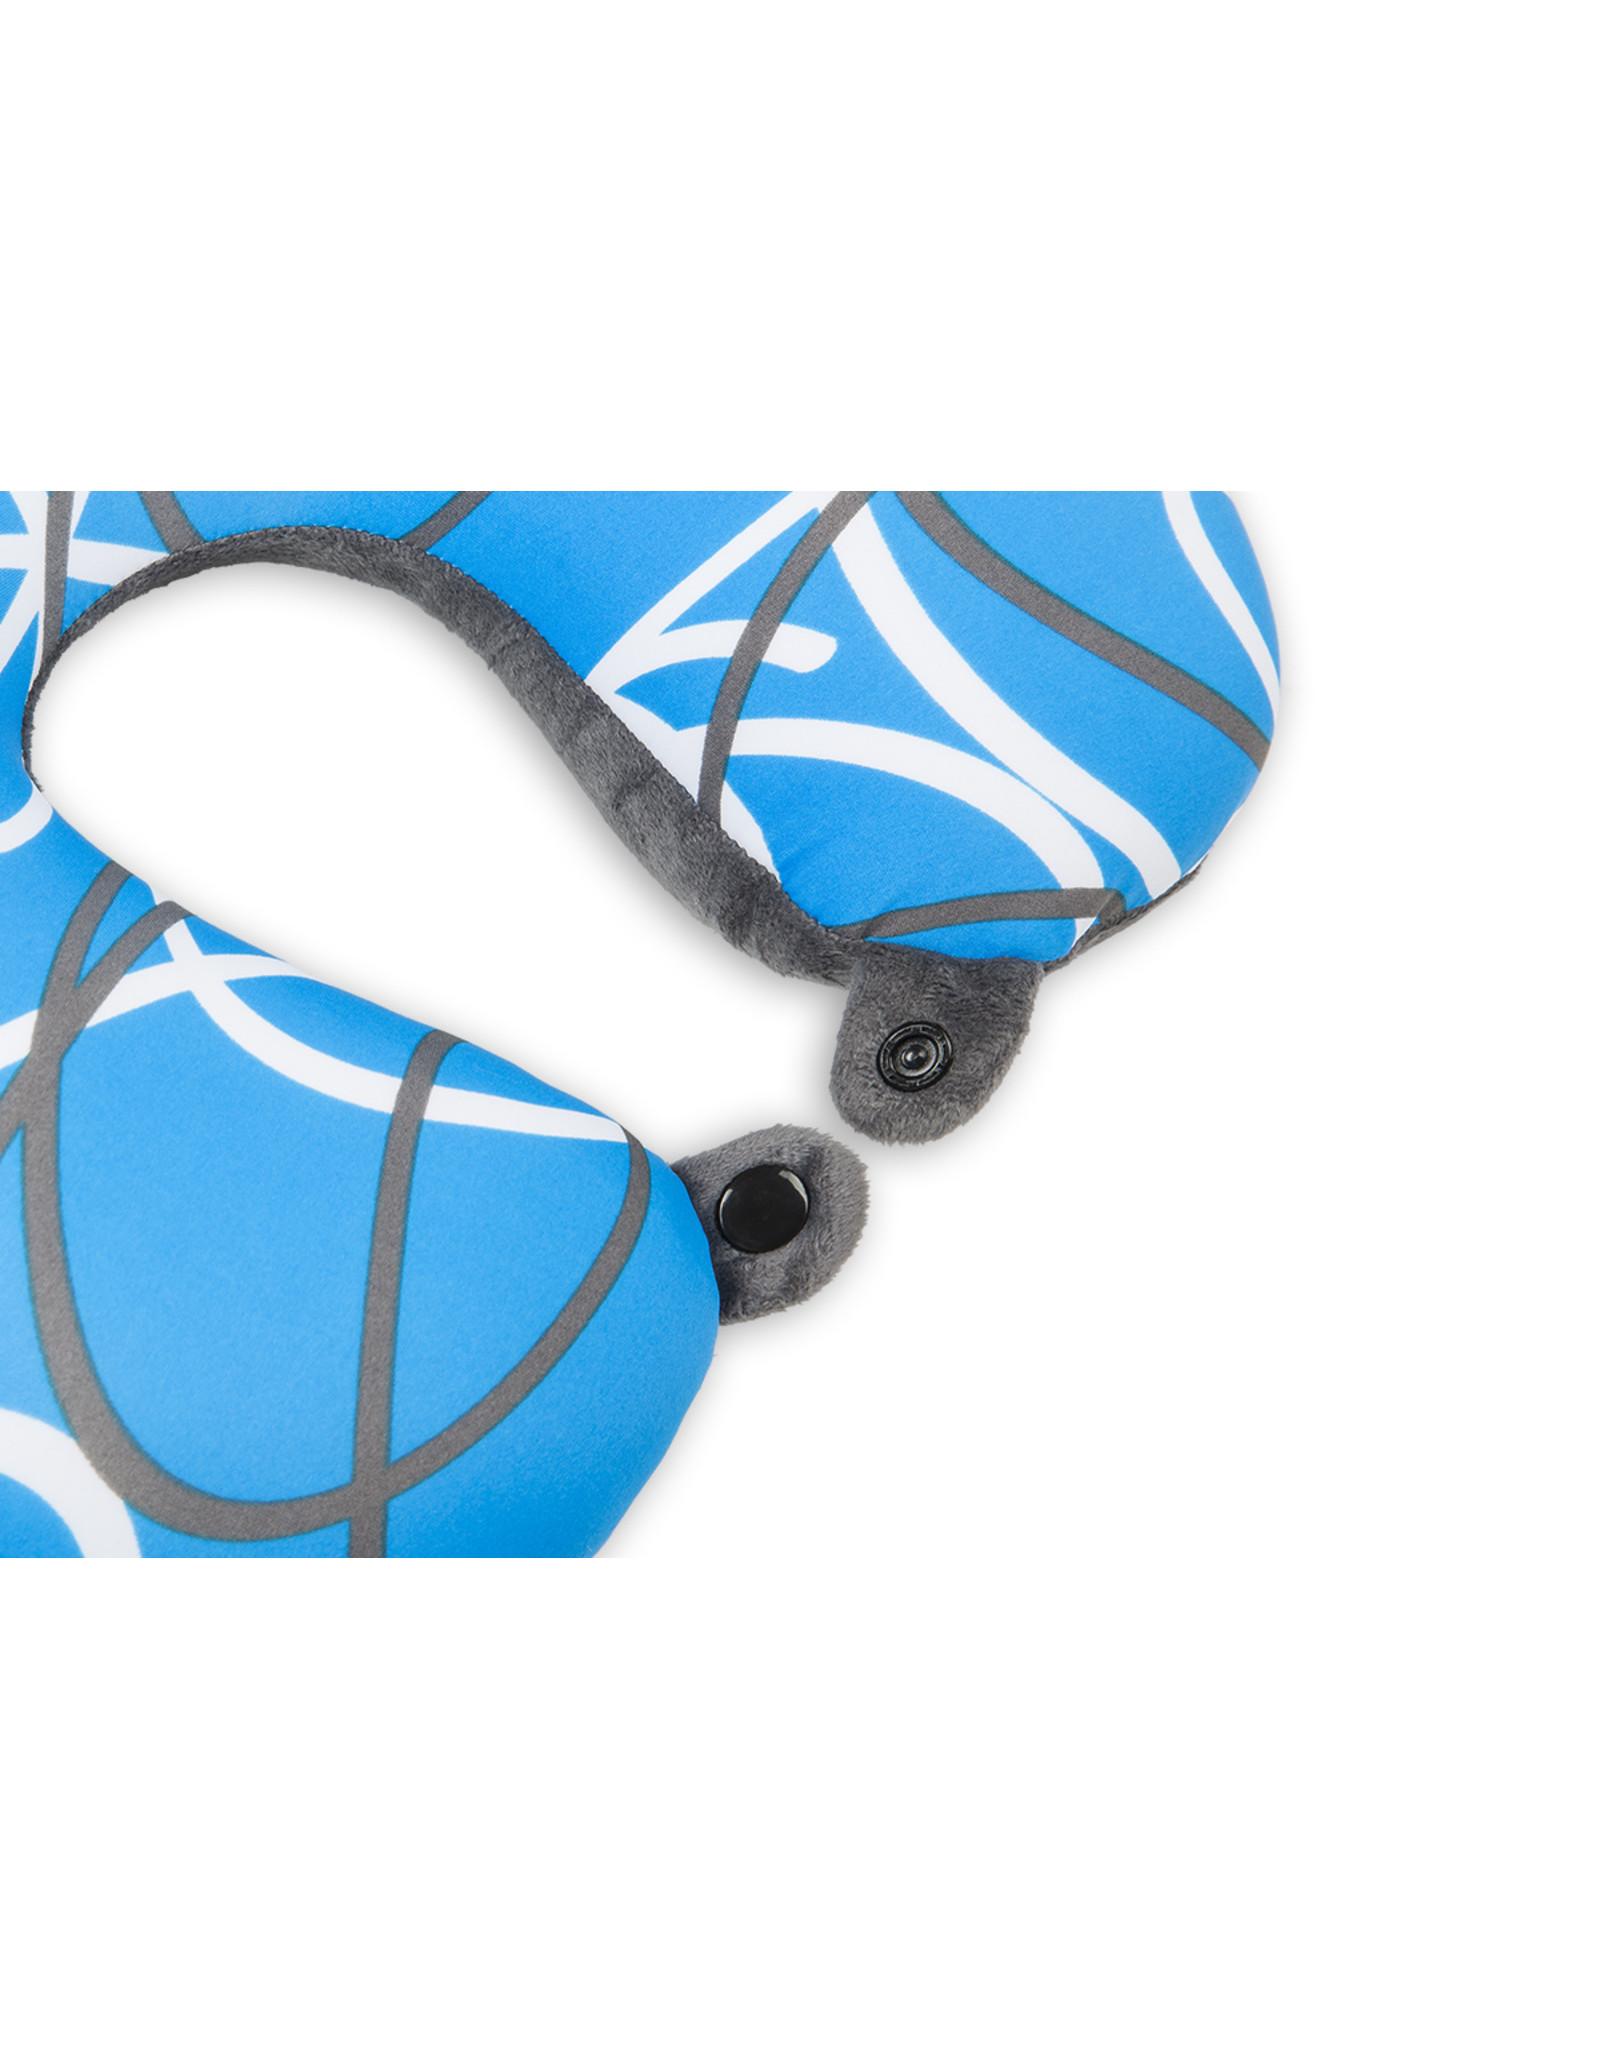 Kuschel-Maxx Kuschel-Maxx - Nack cushion Lines Blue